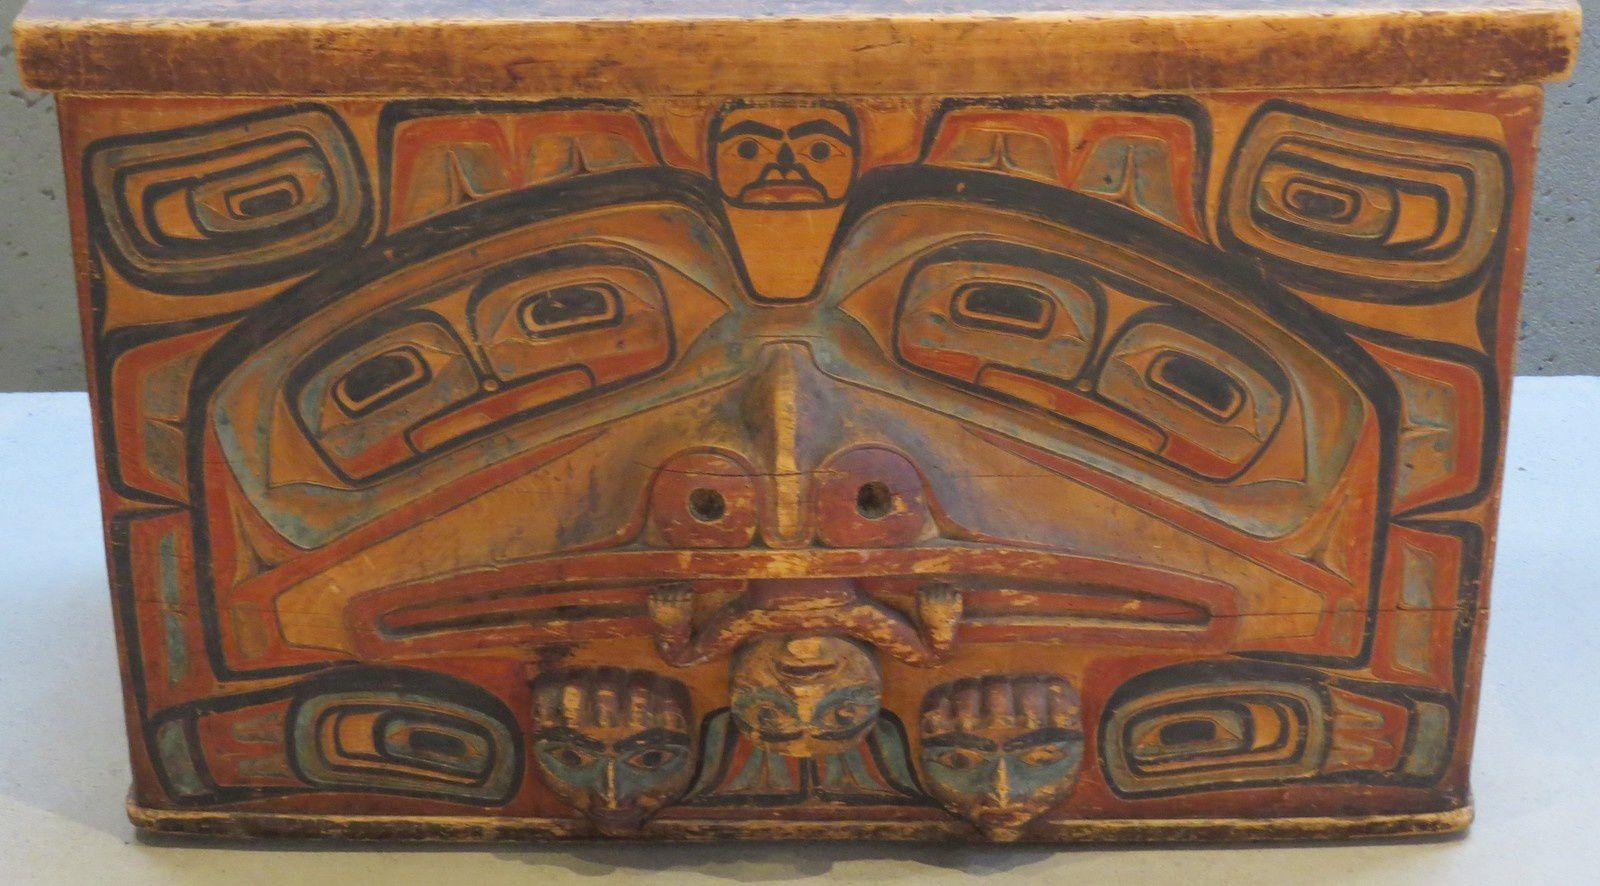 ALASKA 2015 (4.- Tlingit et Tsimshian)